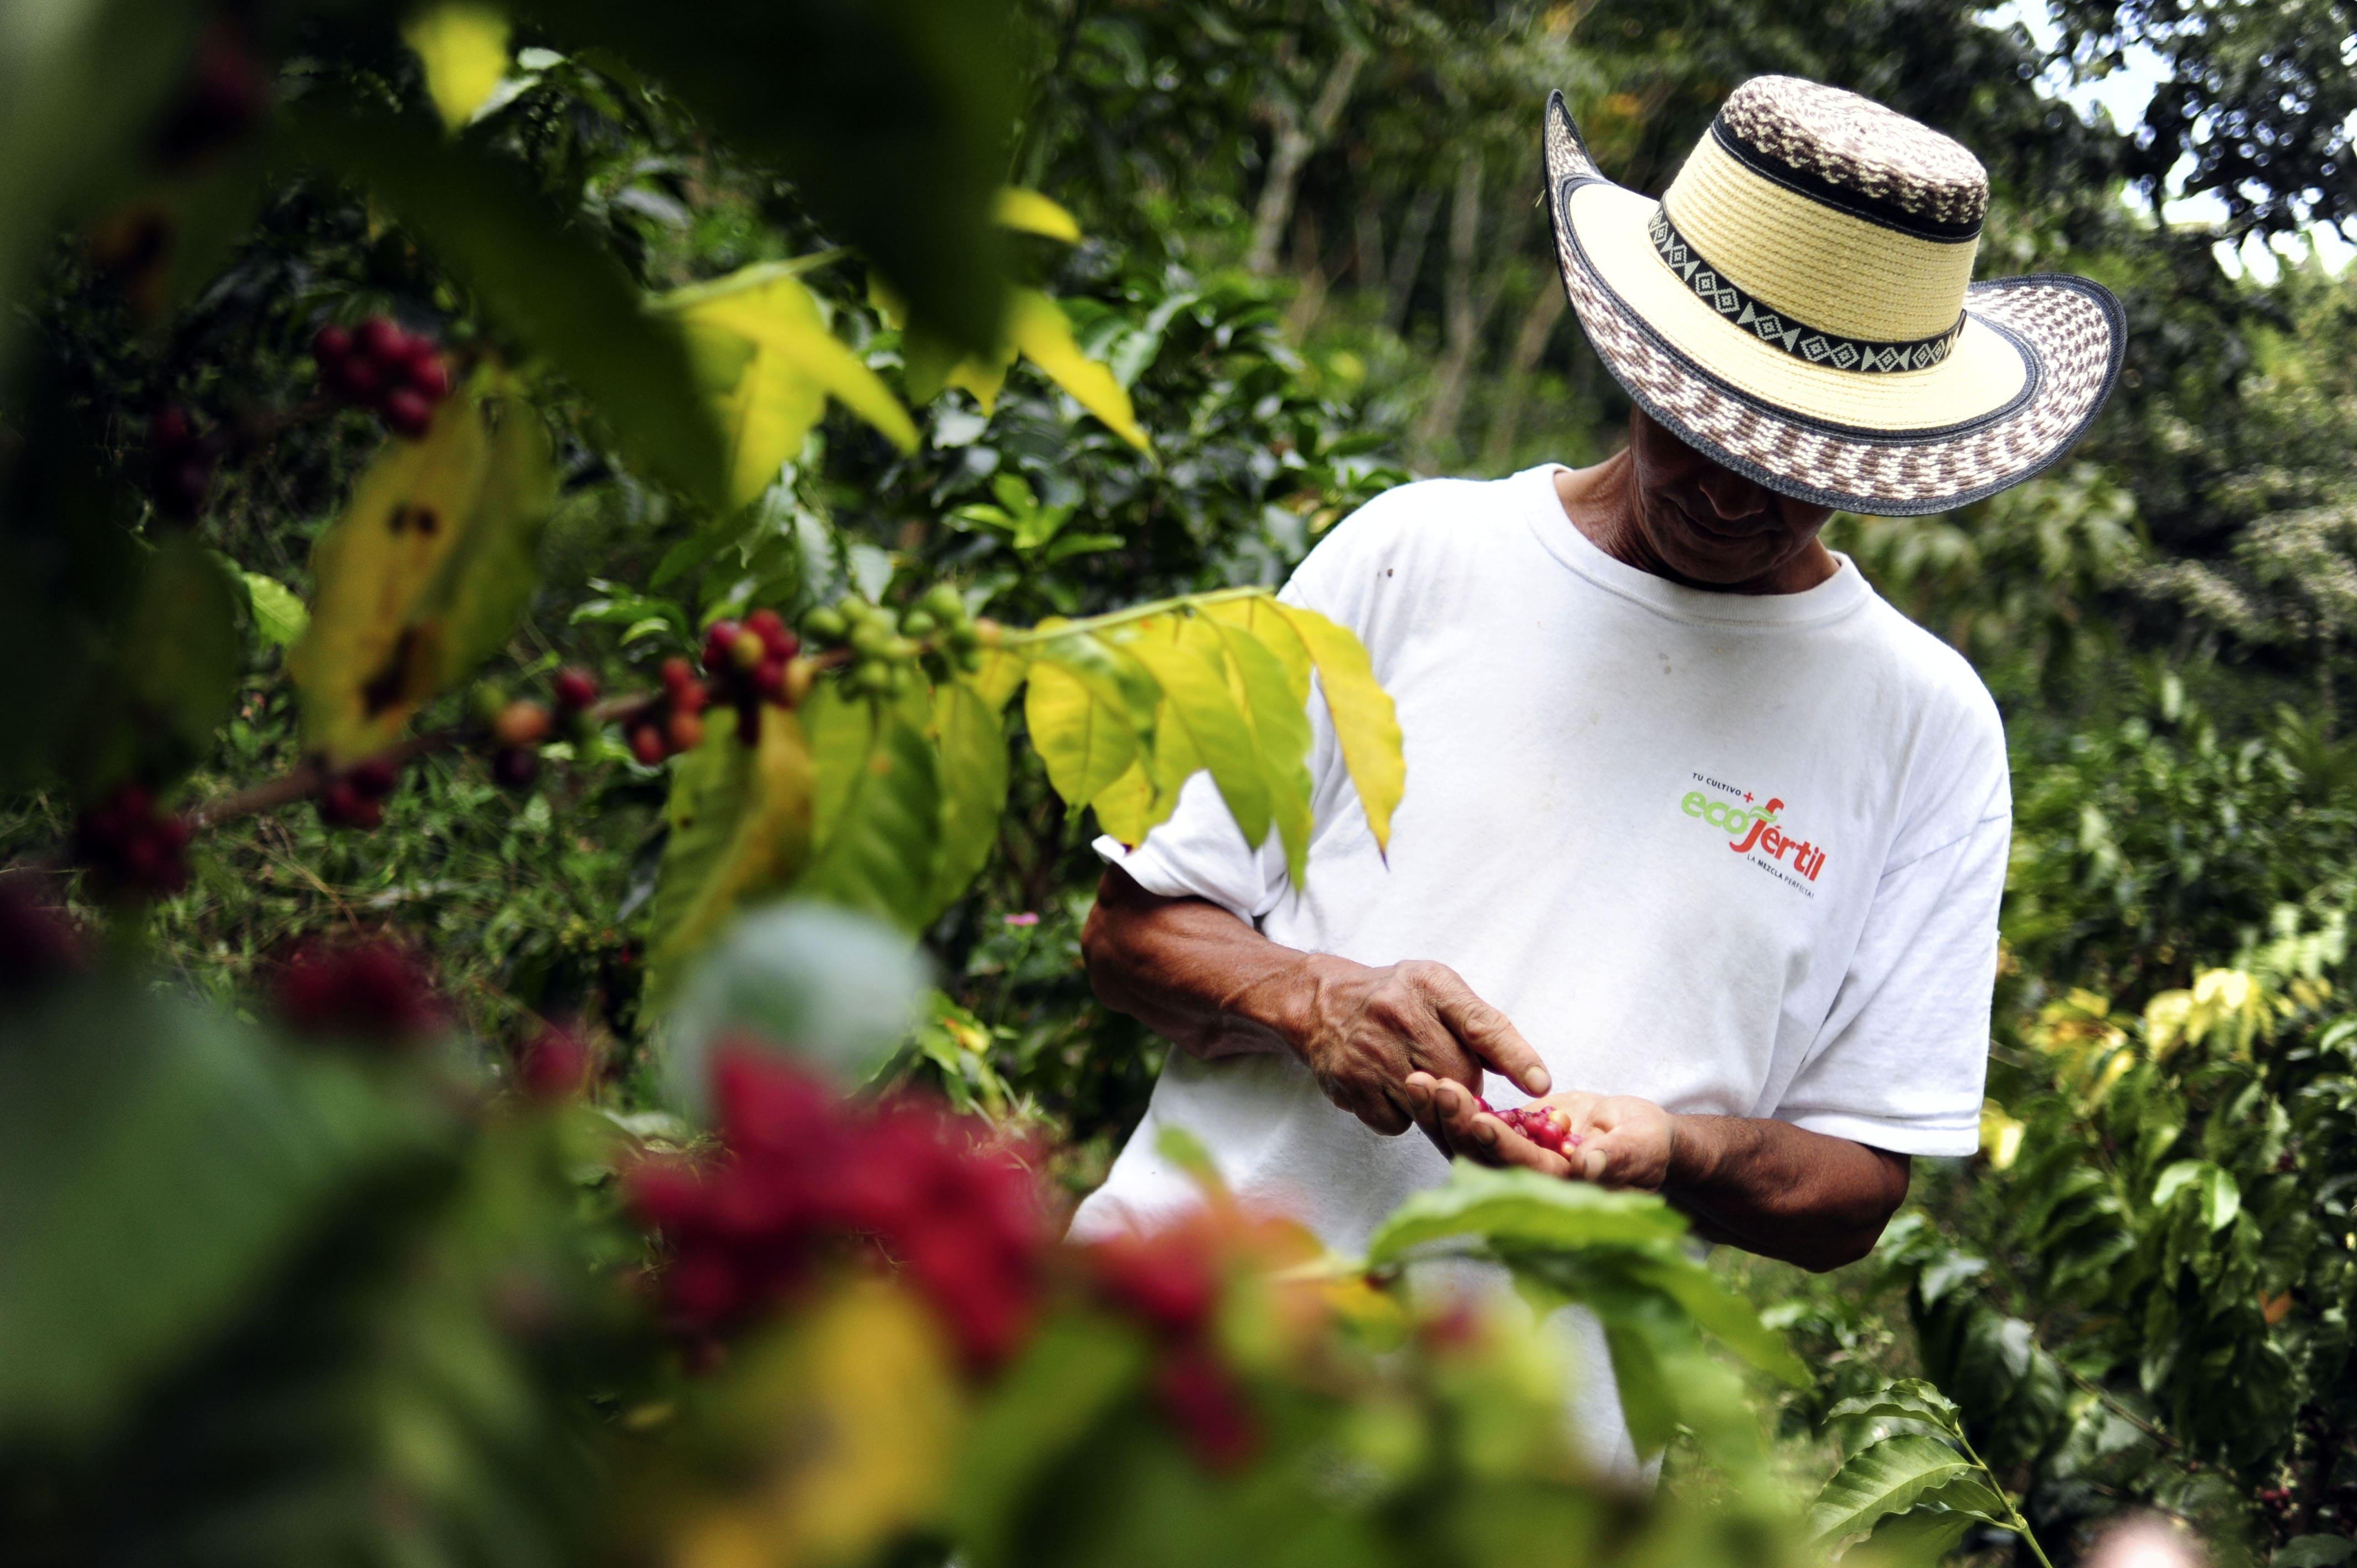 Coffee plantations farmer in Colombia